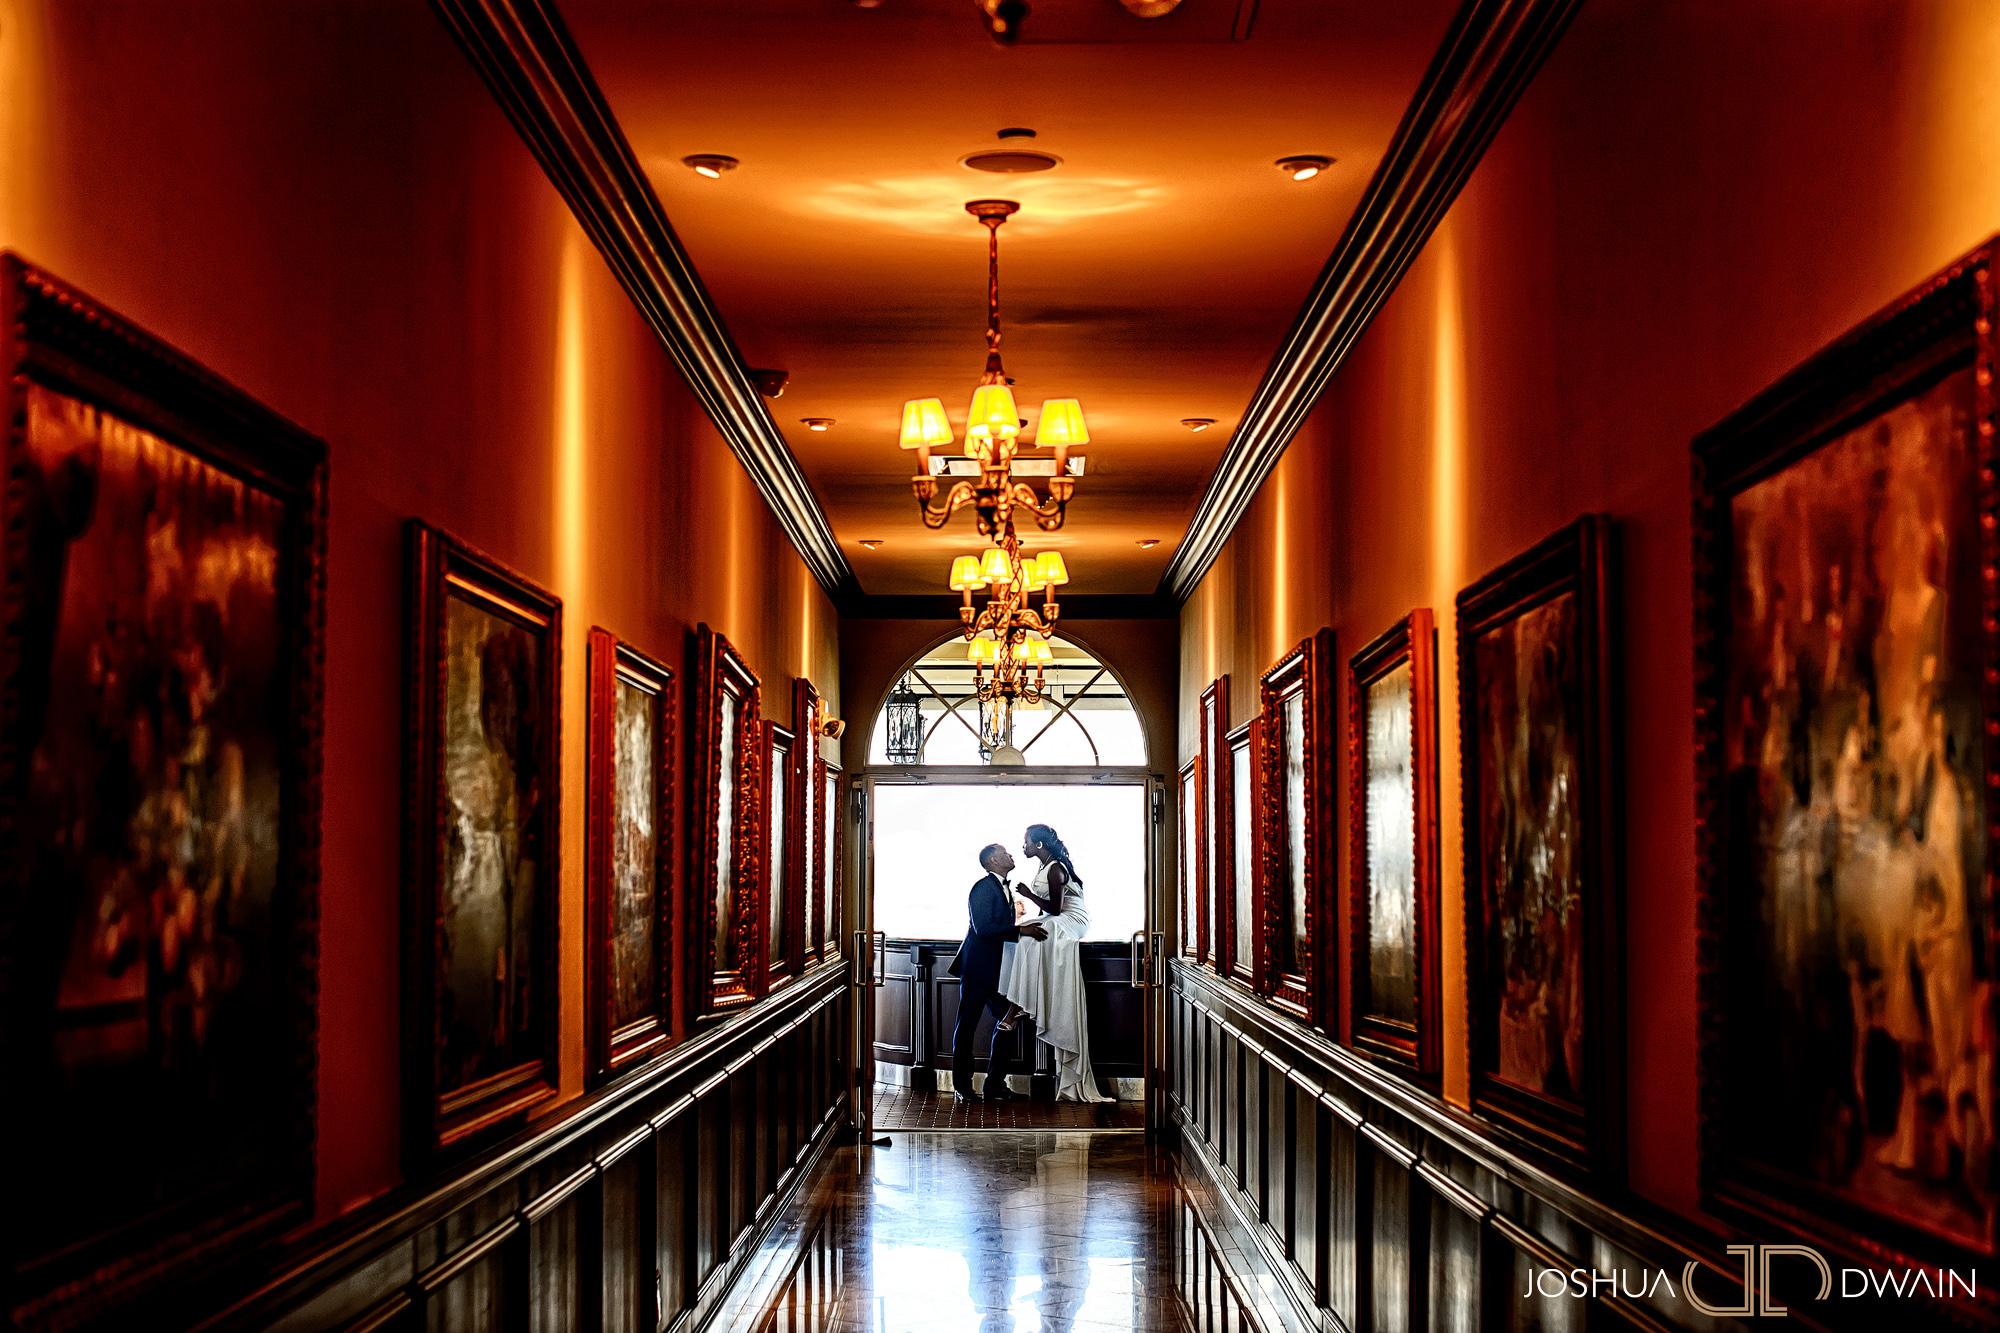 joshua-dwain-weddings-gallery-best-wedding-photographers-us-059